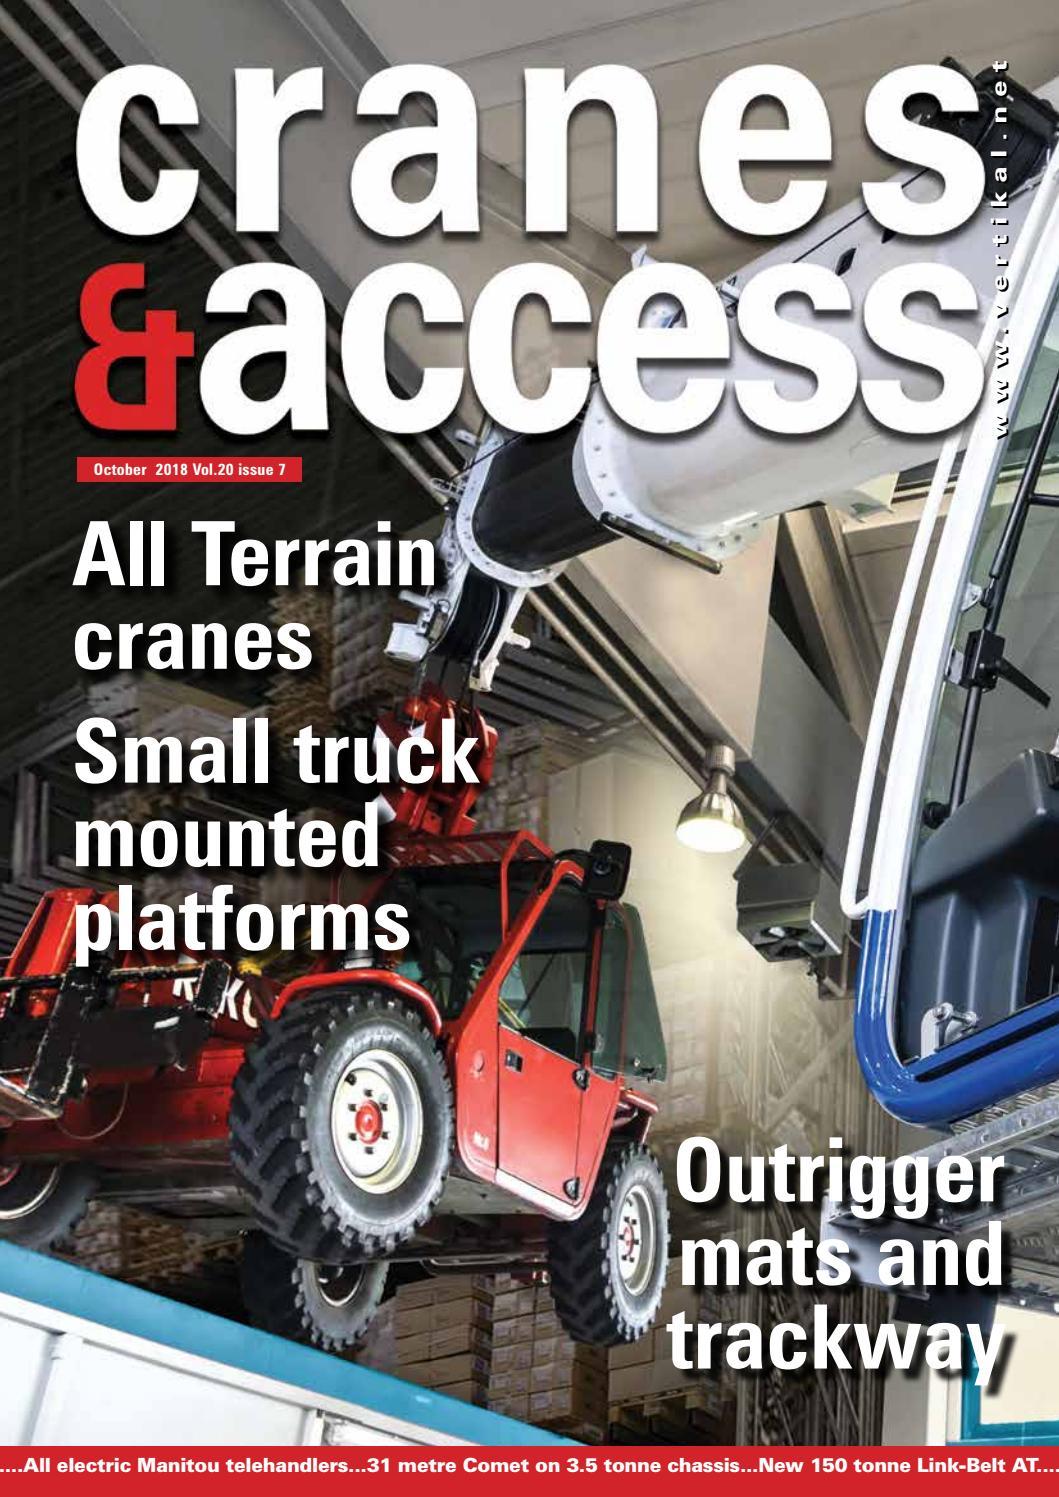 Cranes Access October 2018 By Vertikal Net Issuu